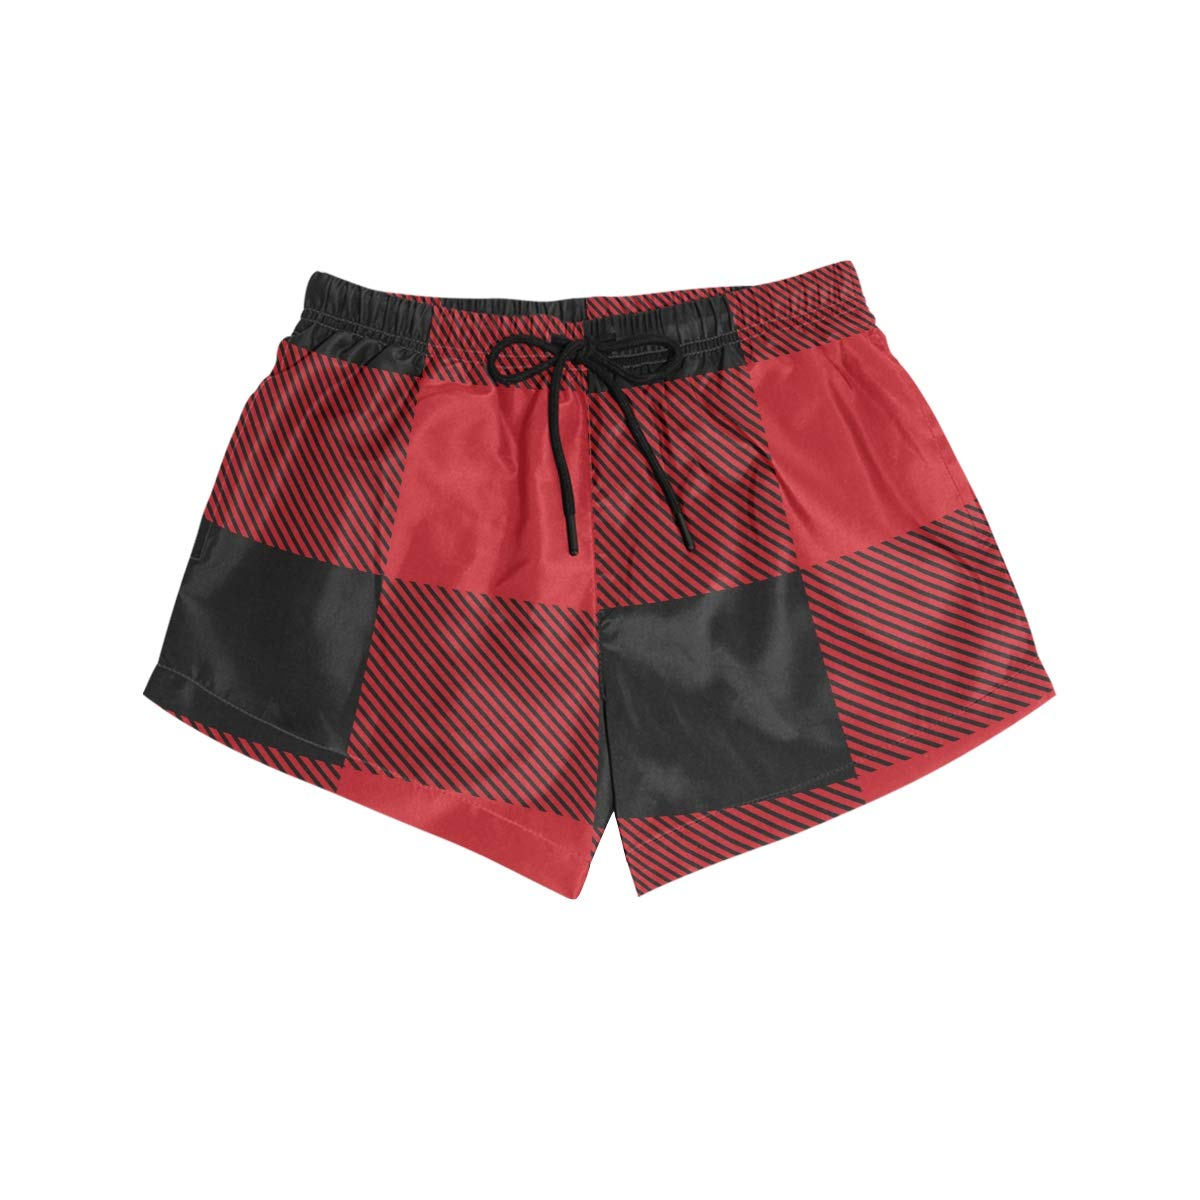 Women Swim Trunks Black Red Big Buffalo Plaid Pattern Classic Beach Board Shorts